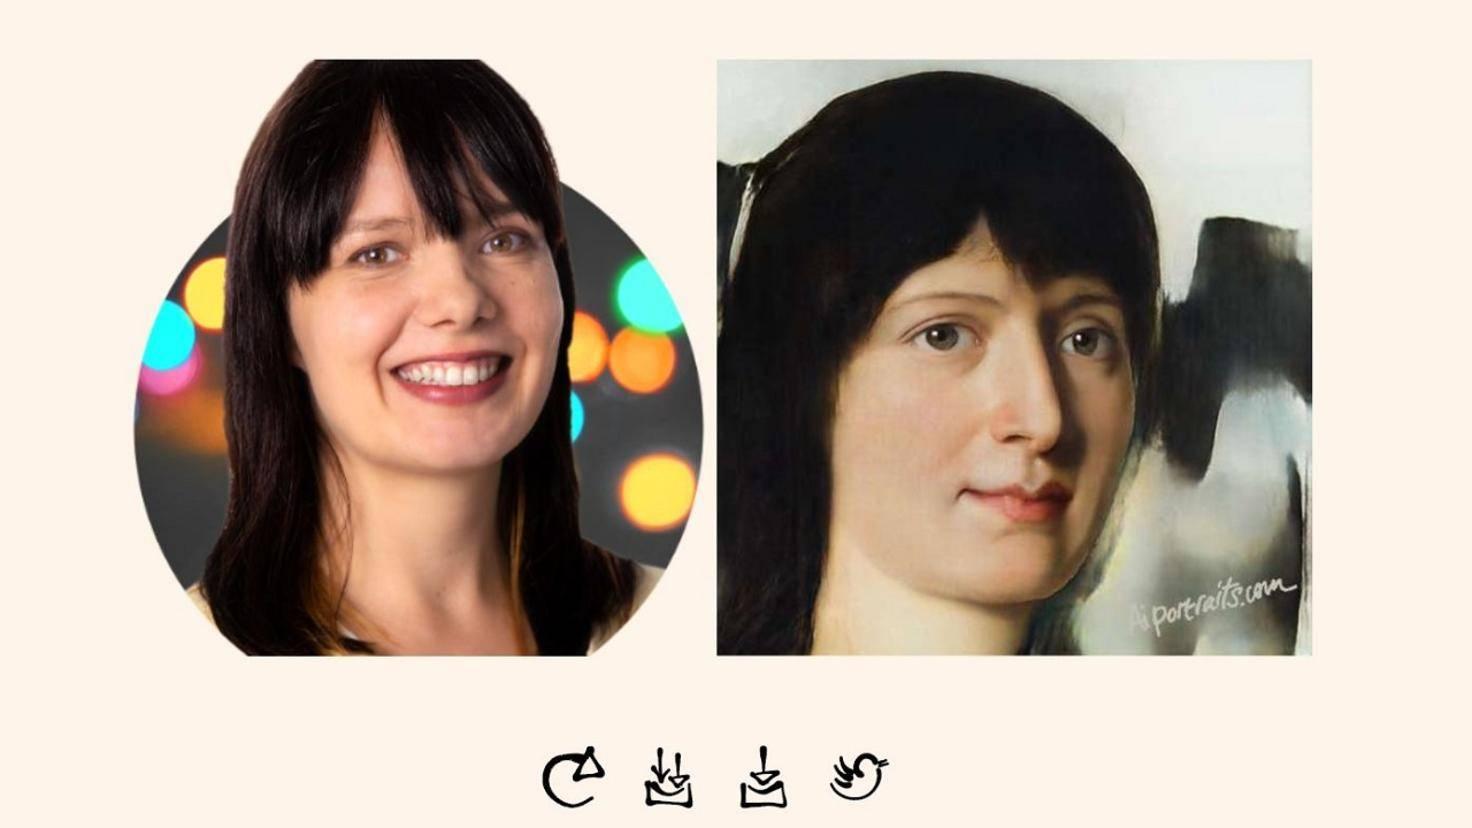 Annika als KI-Porträt